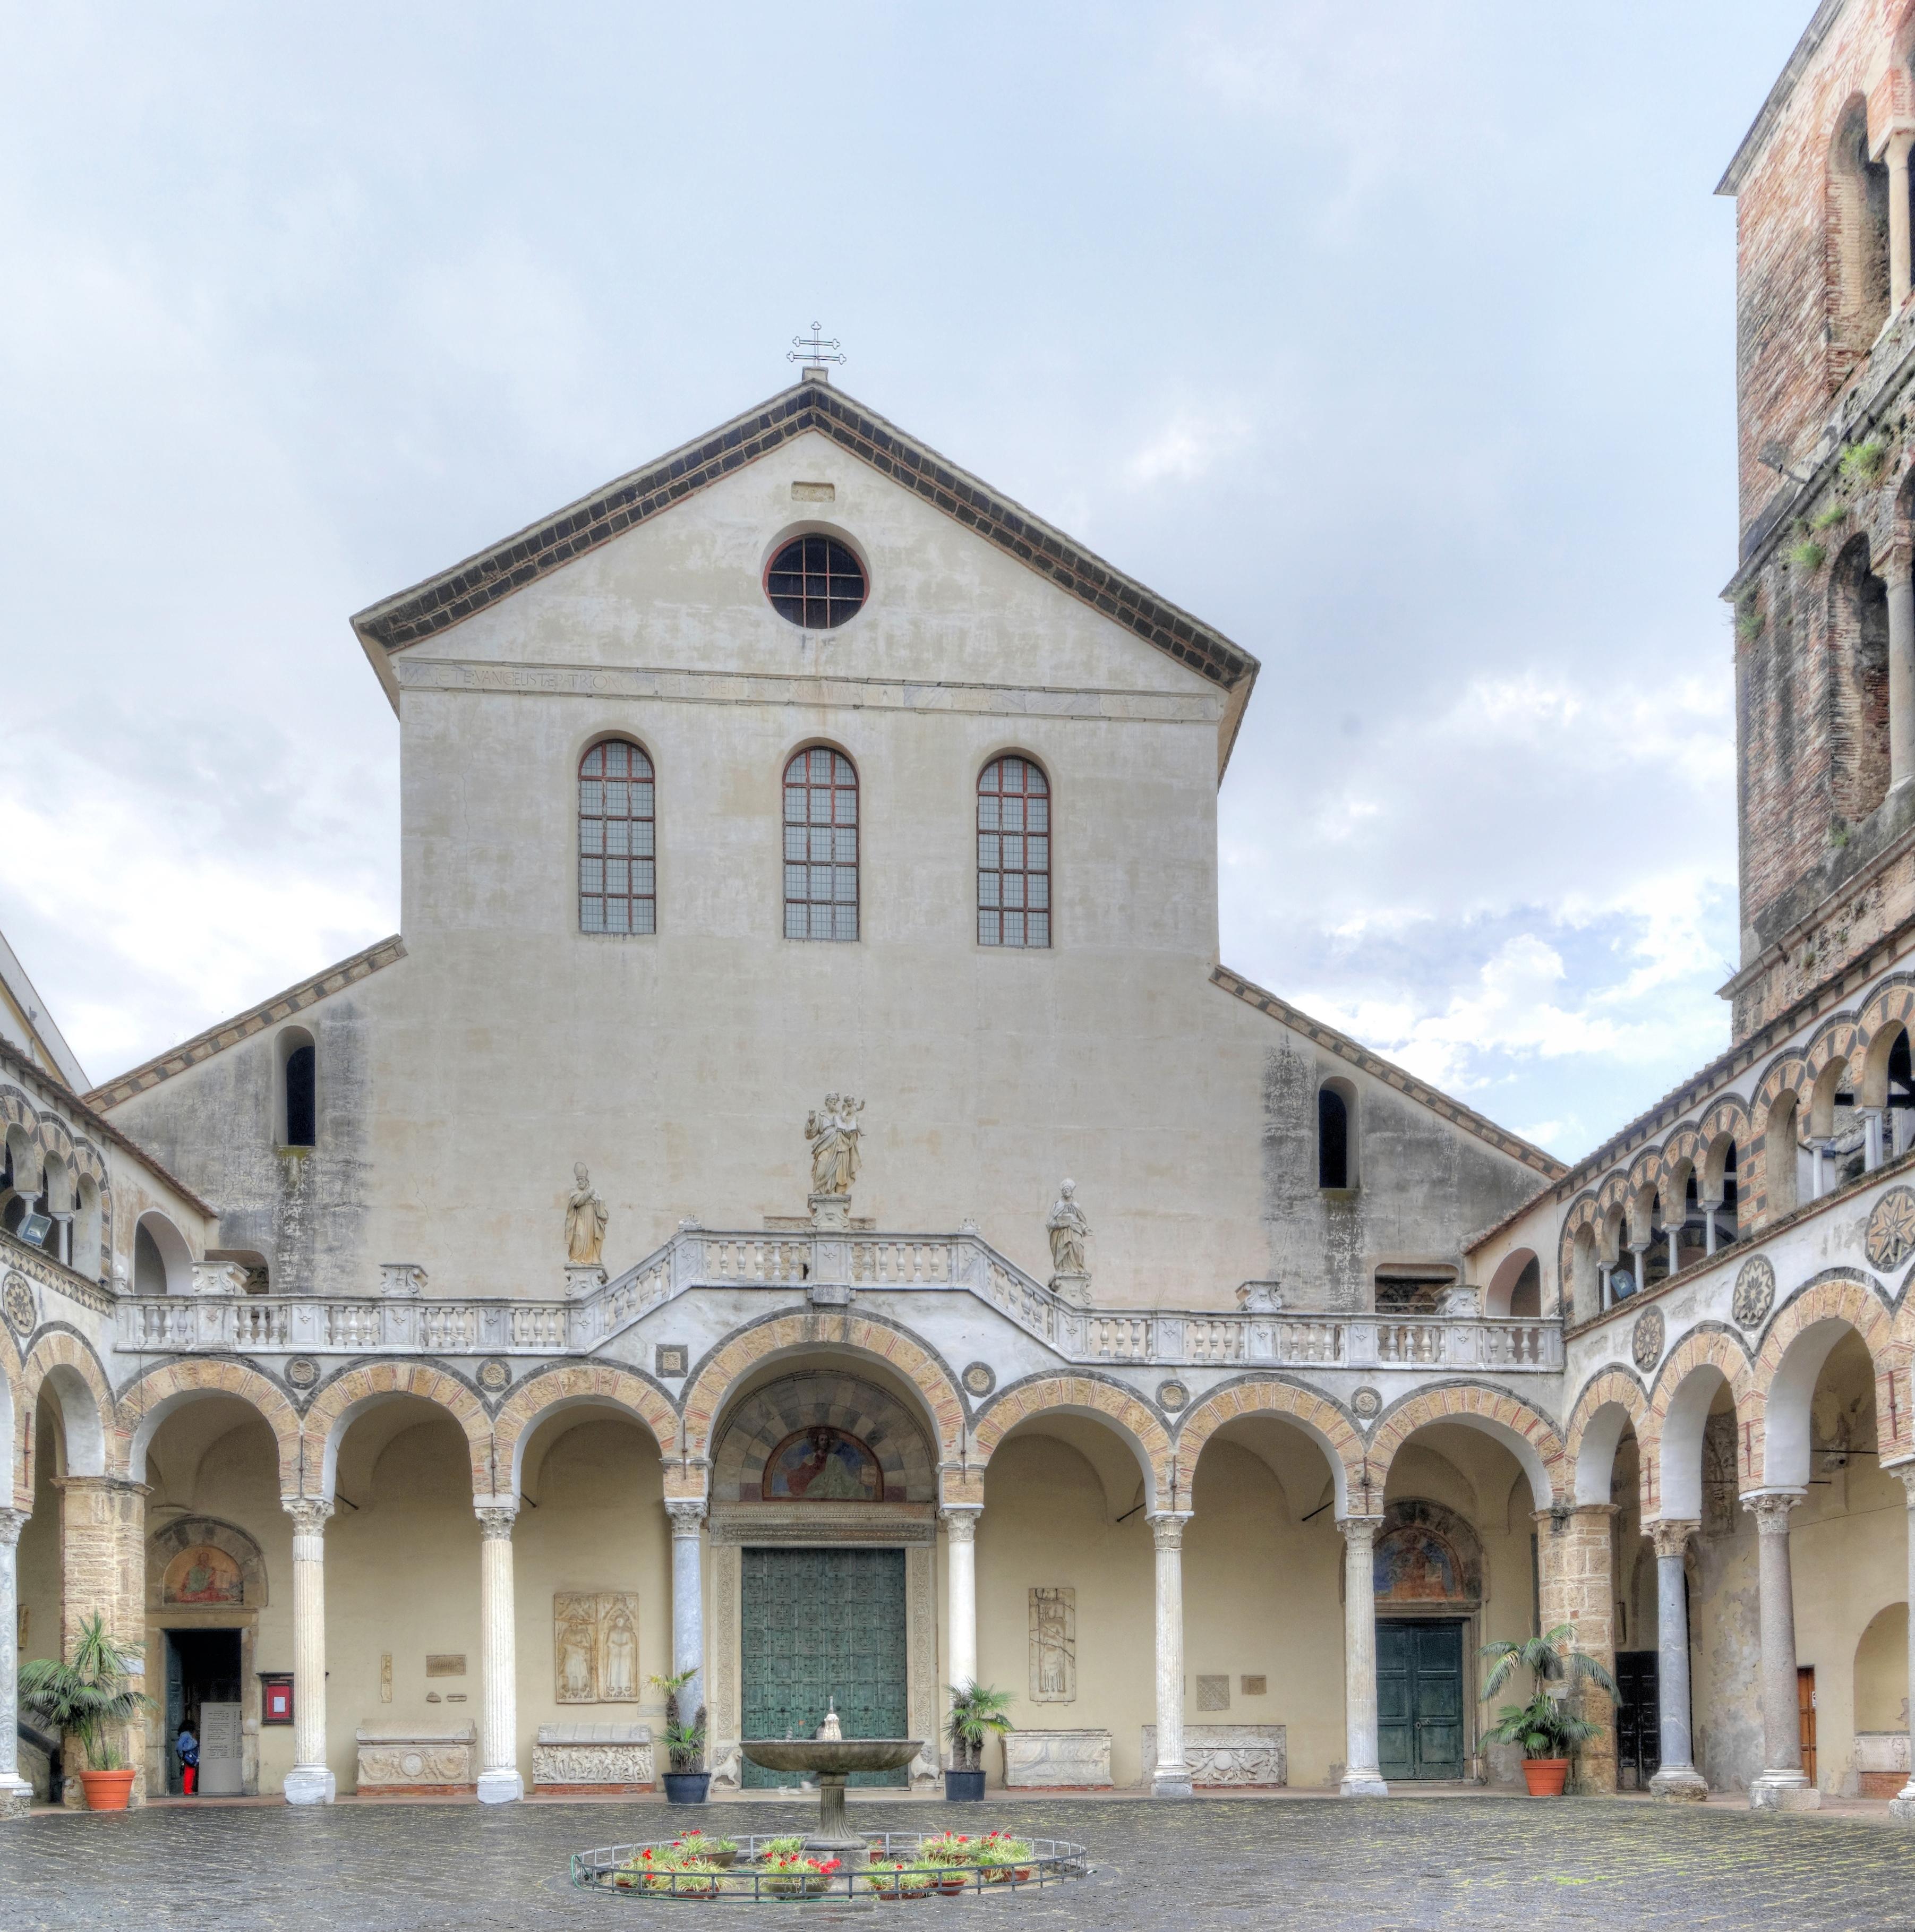 Salerno 2013 05 17 09 37 10